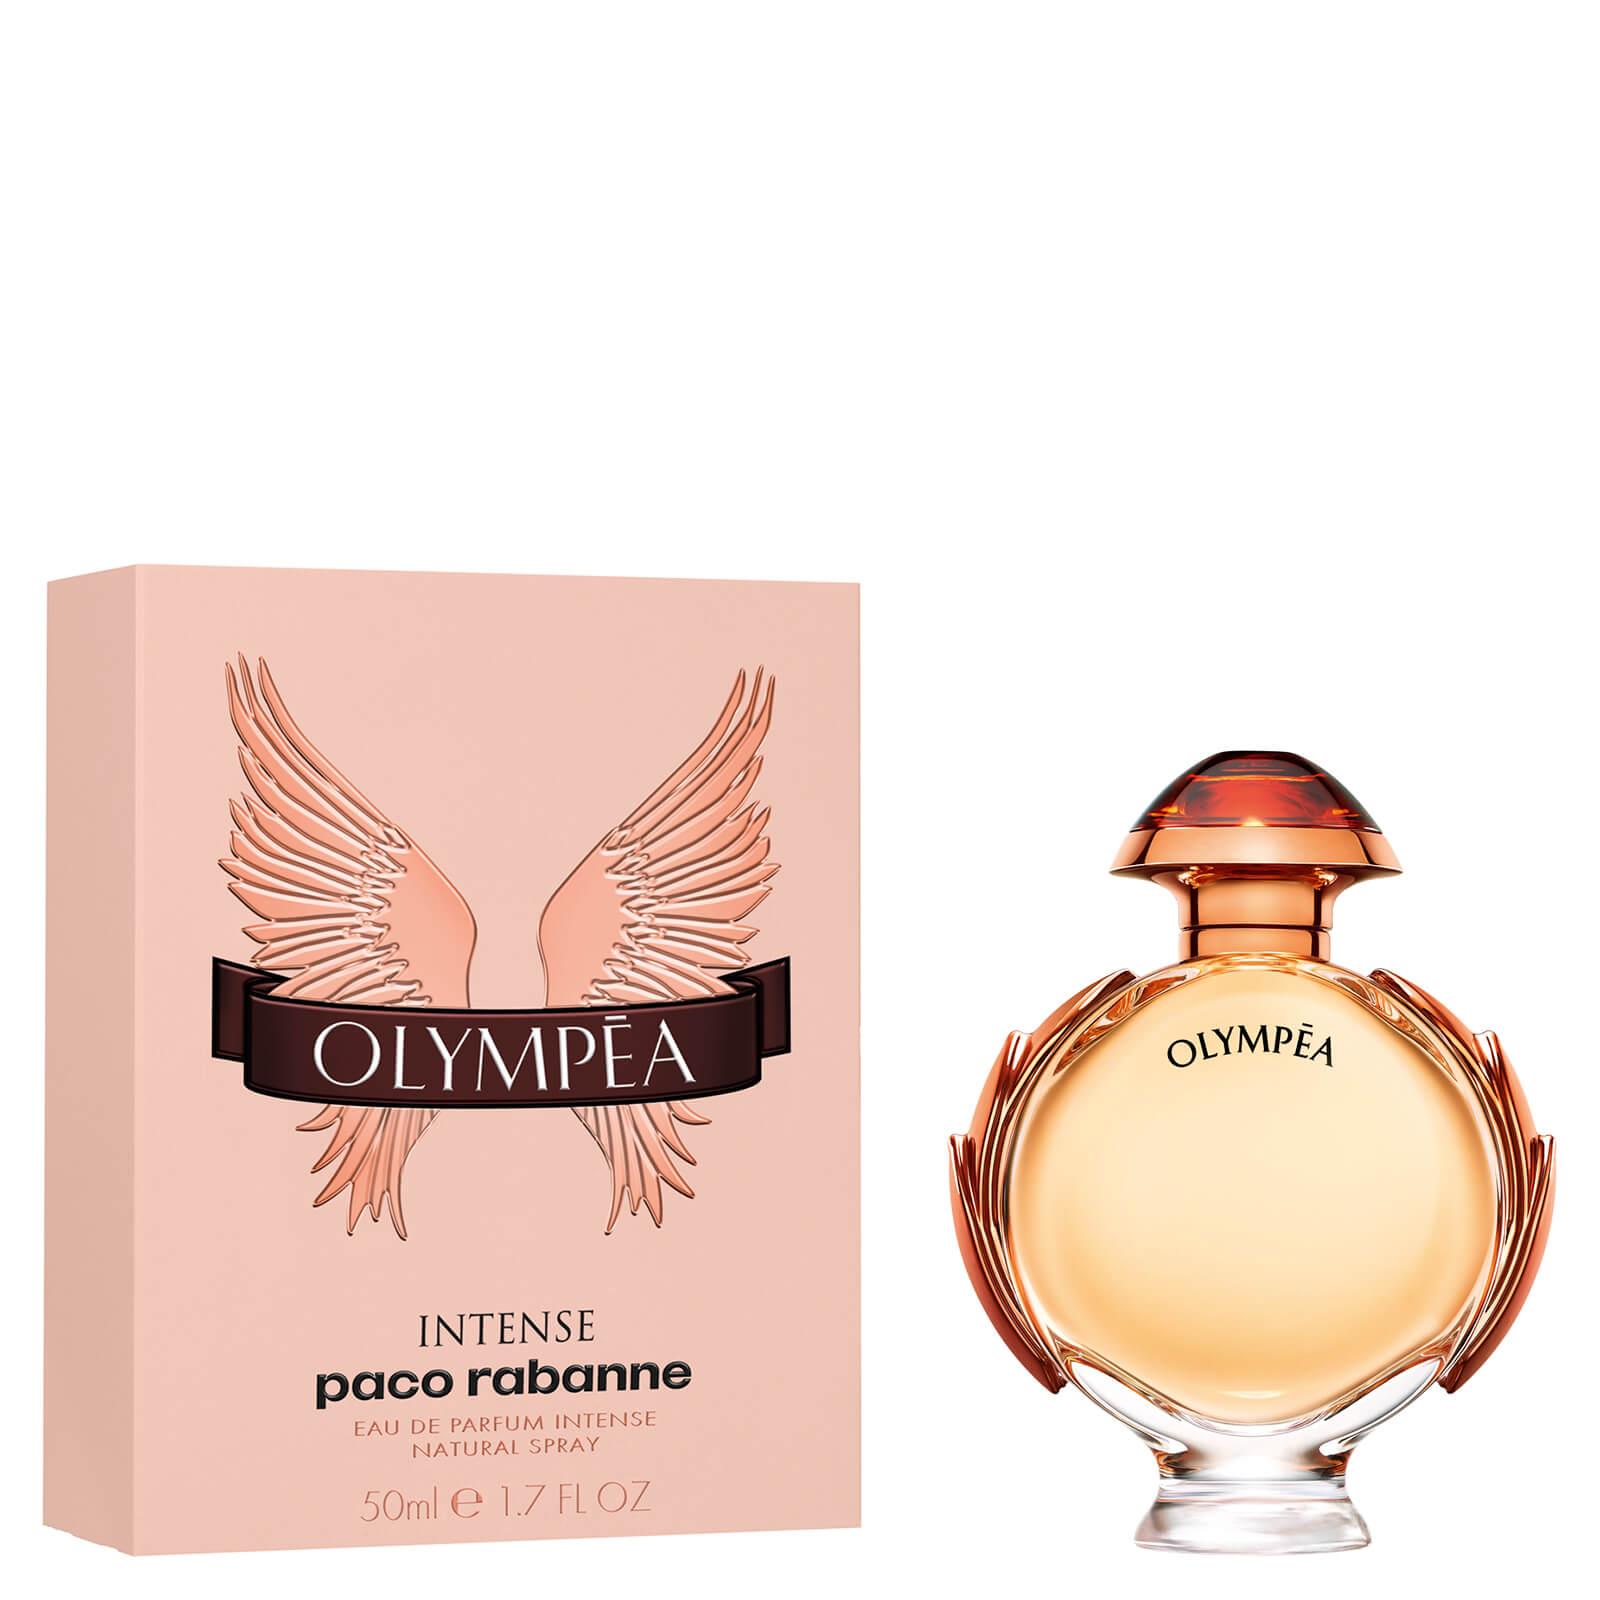 50ml Rabanne Intense Parfum Paco Olympea De Eau If7ybmgY6v